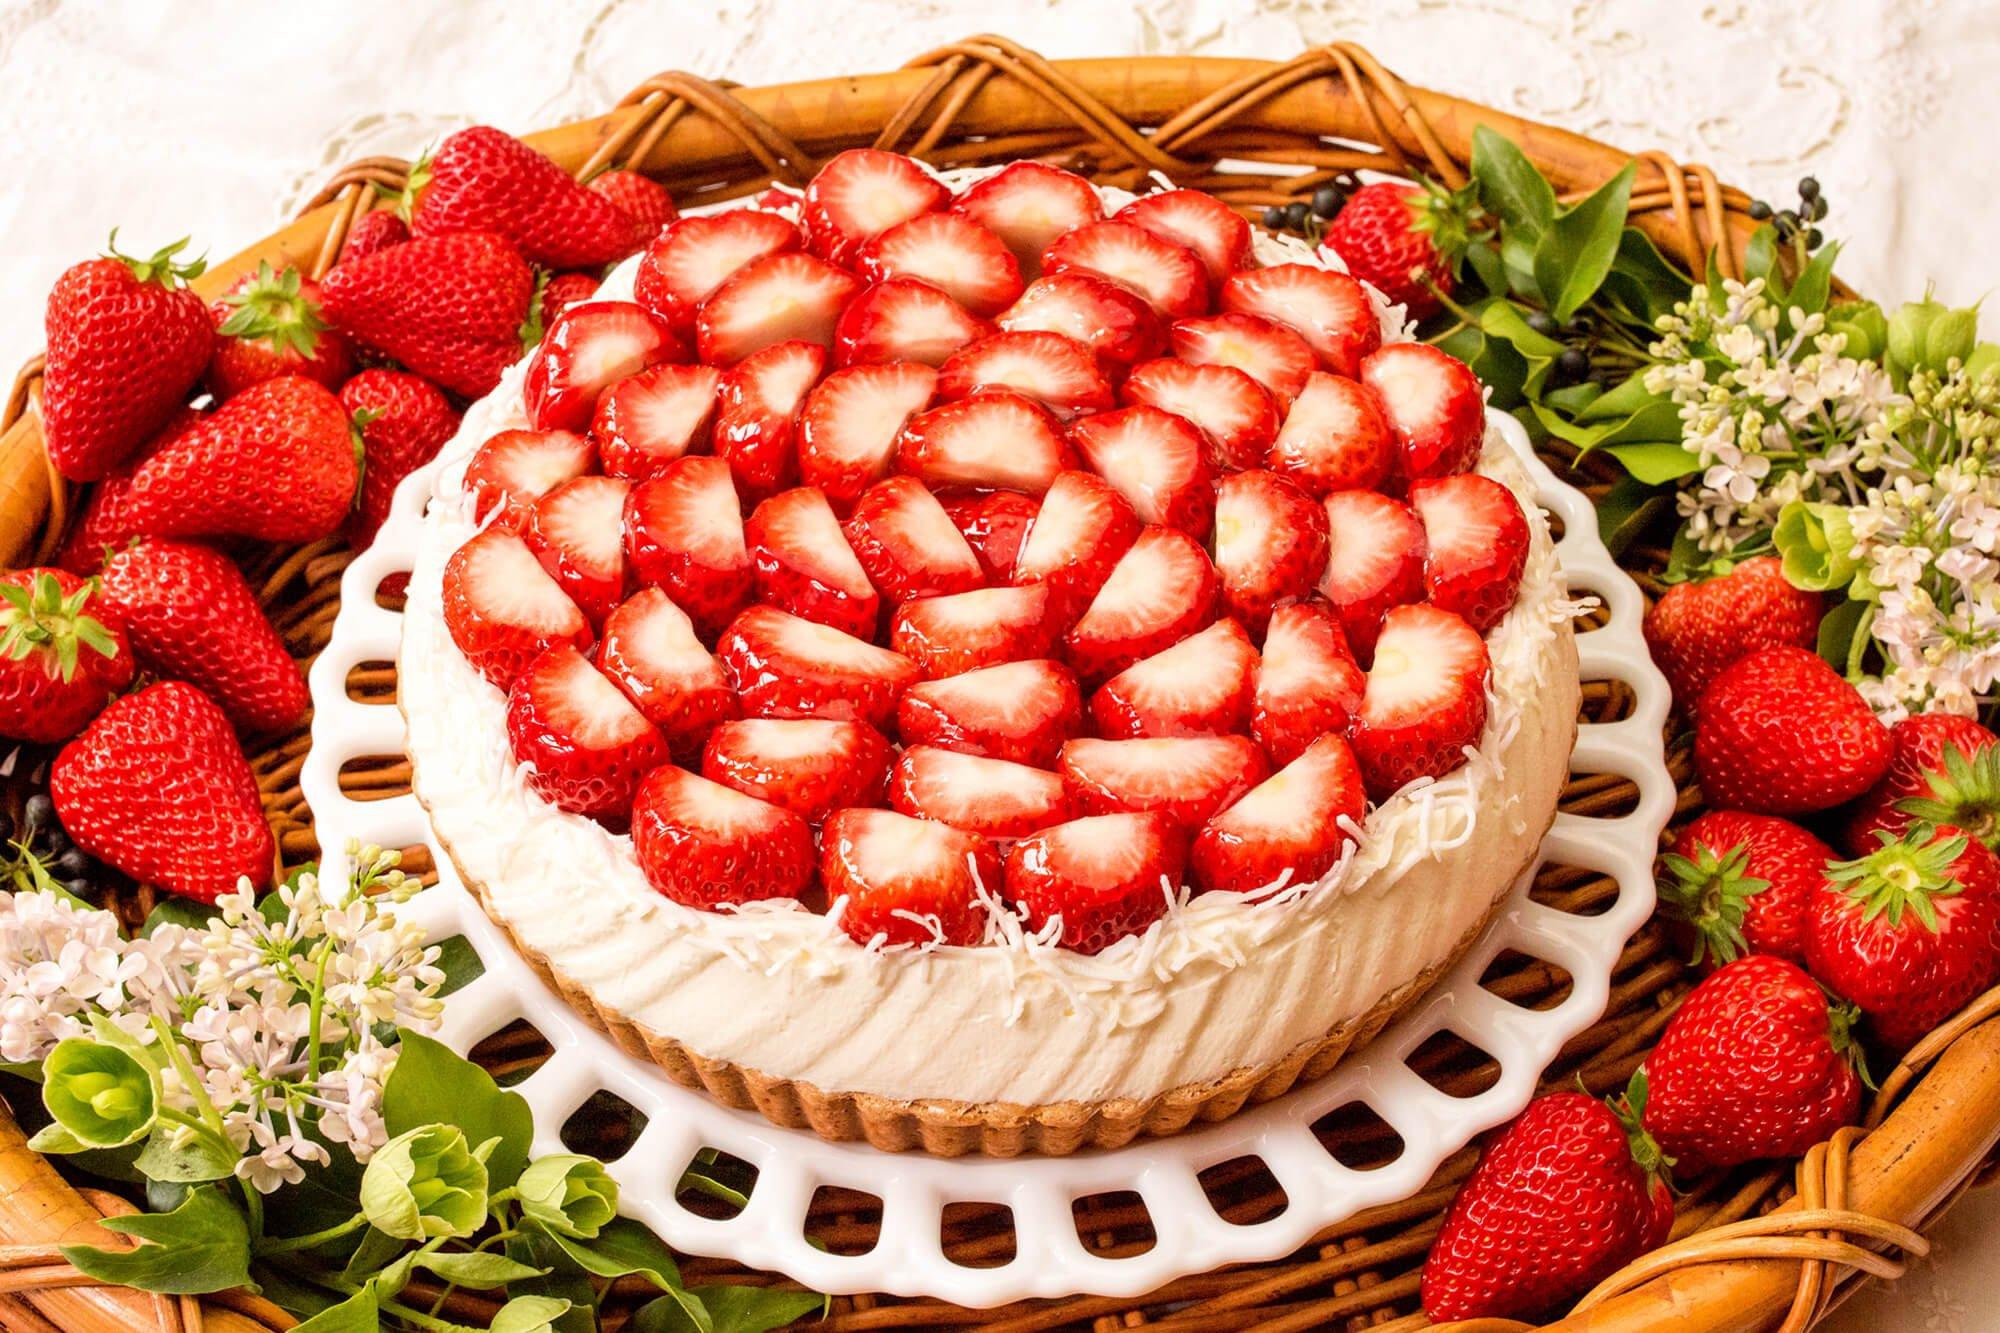 Qu'il fait bon靜岡店 推出早晨現摘寒蜜草莓塔限定販售 在静岡、甜點、莓、